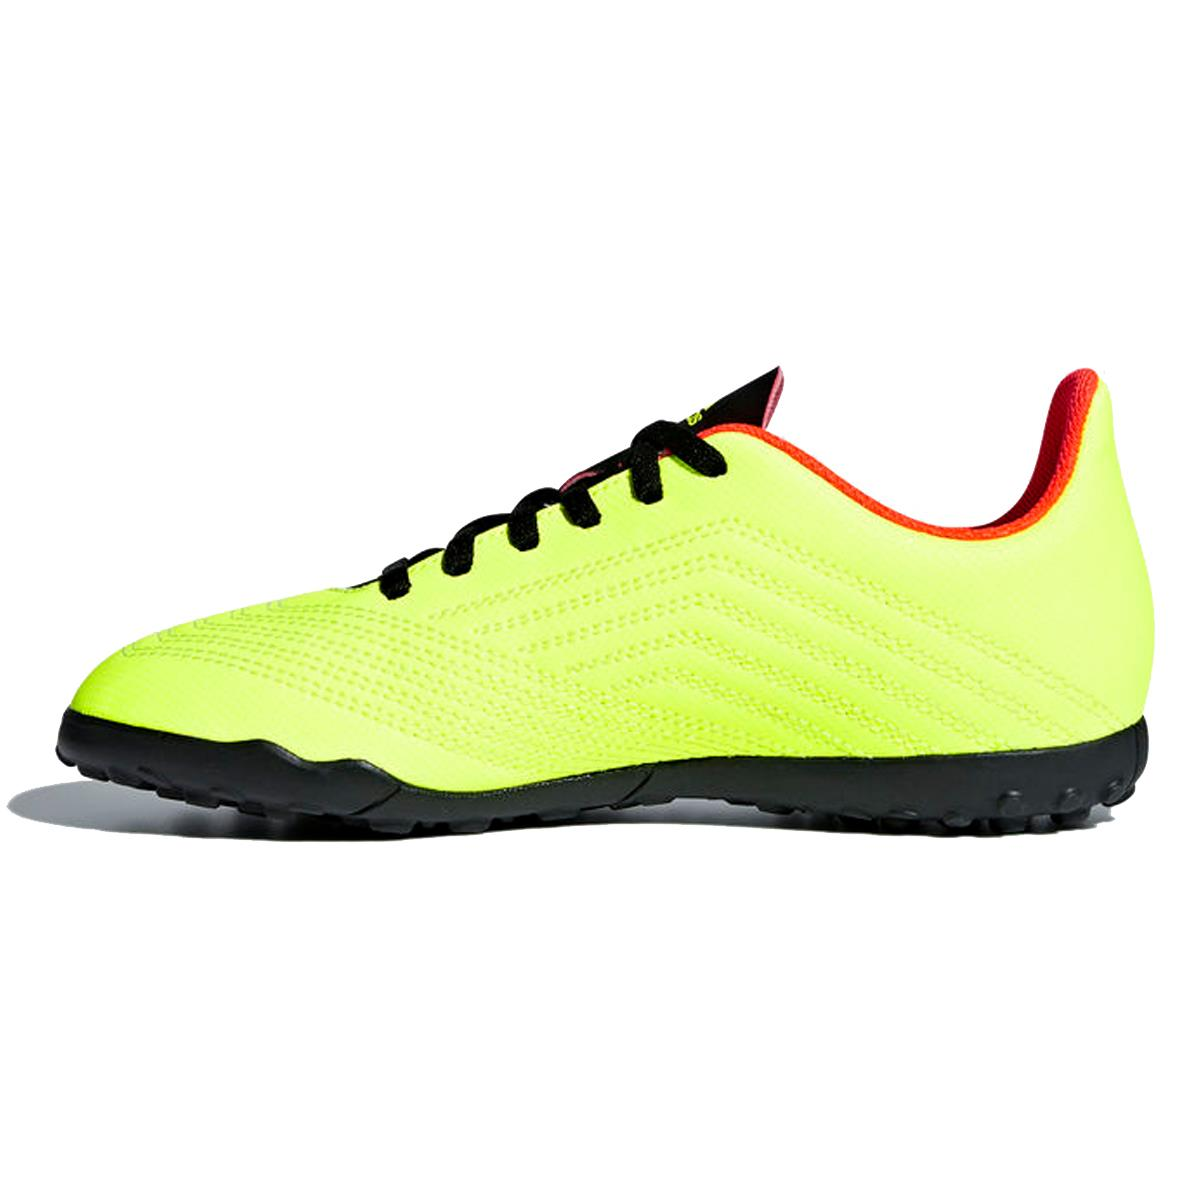 30699 chuteira-society-adidas-predator-tango-18-4-infantil-amarela -neon z2 636649394742047183.jpg e59cc6b635703